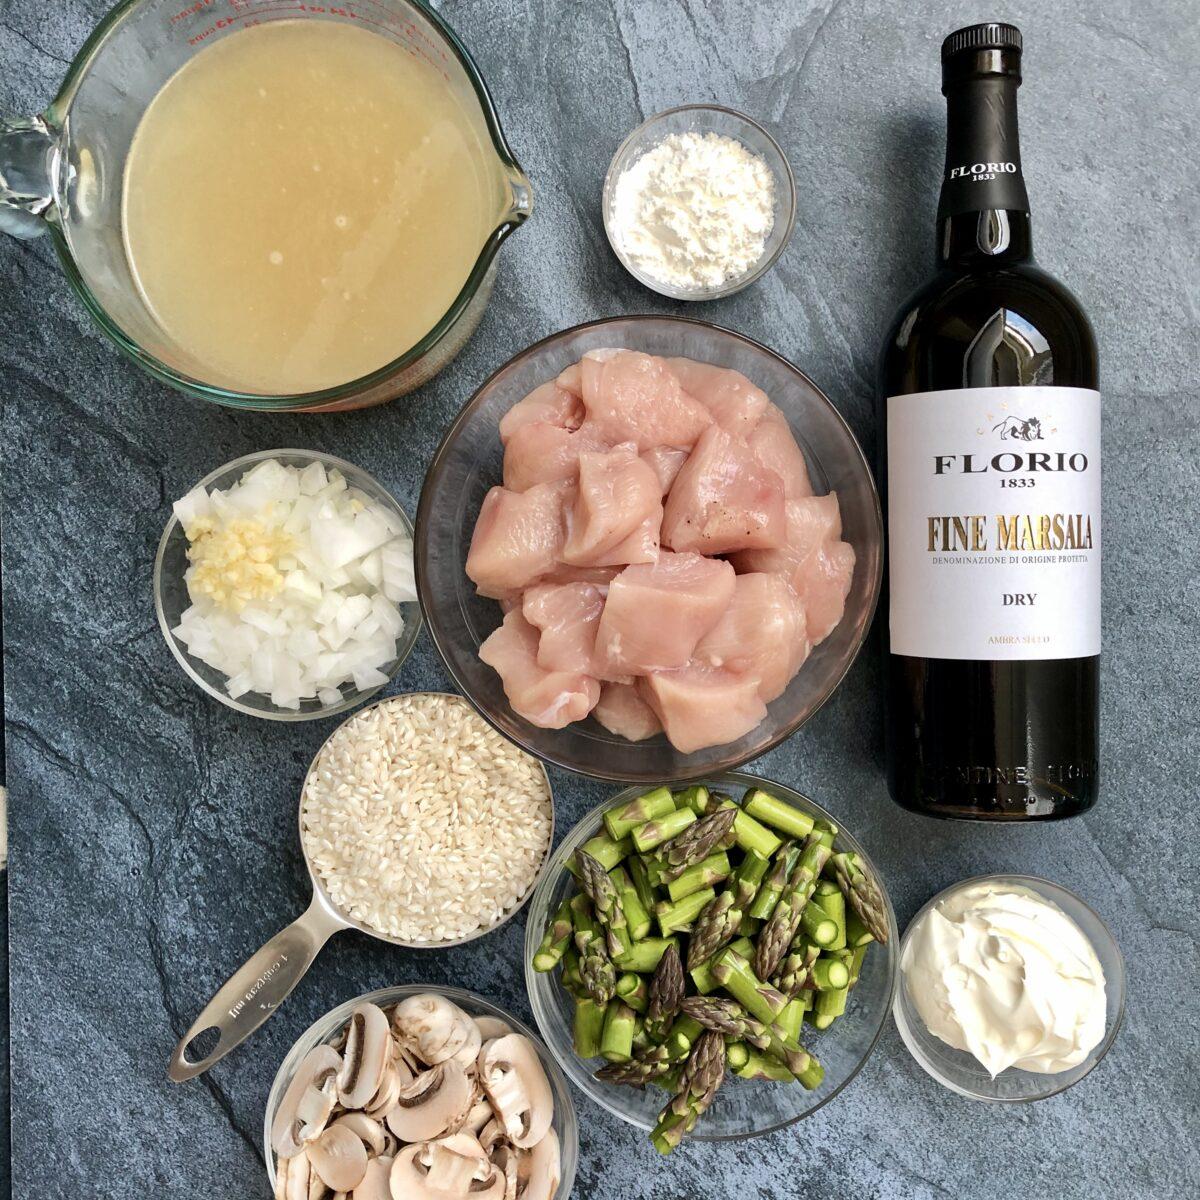 Raw chicken breast, marsala wine, sliced mushrooms, asparagus, arborio rice, chicken stock and marscapone cheese